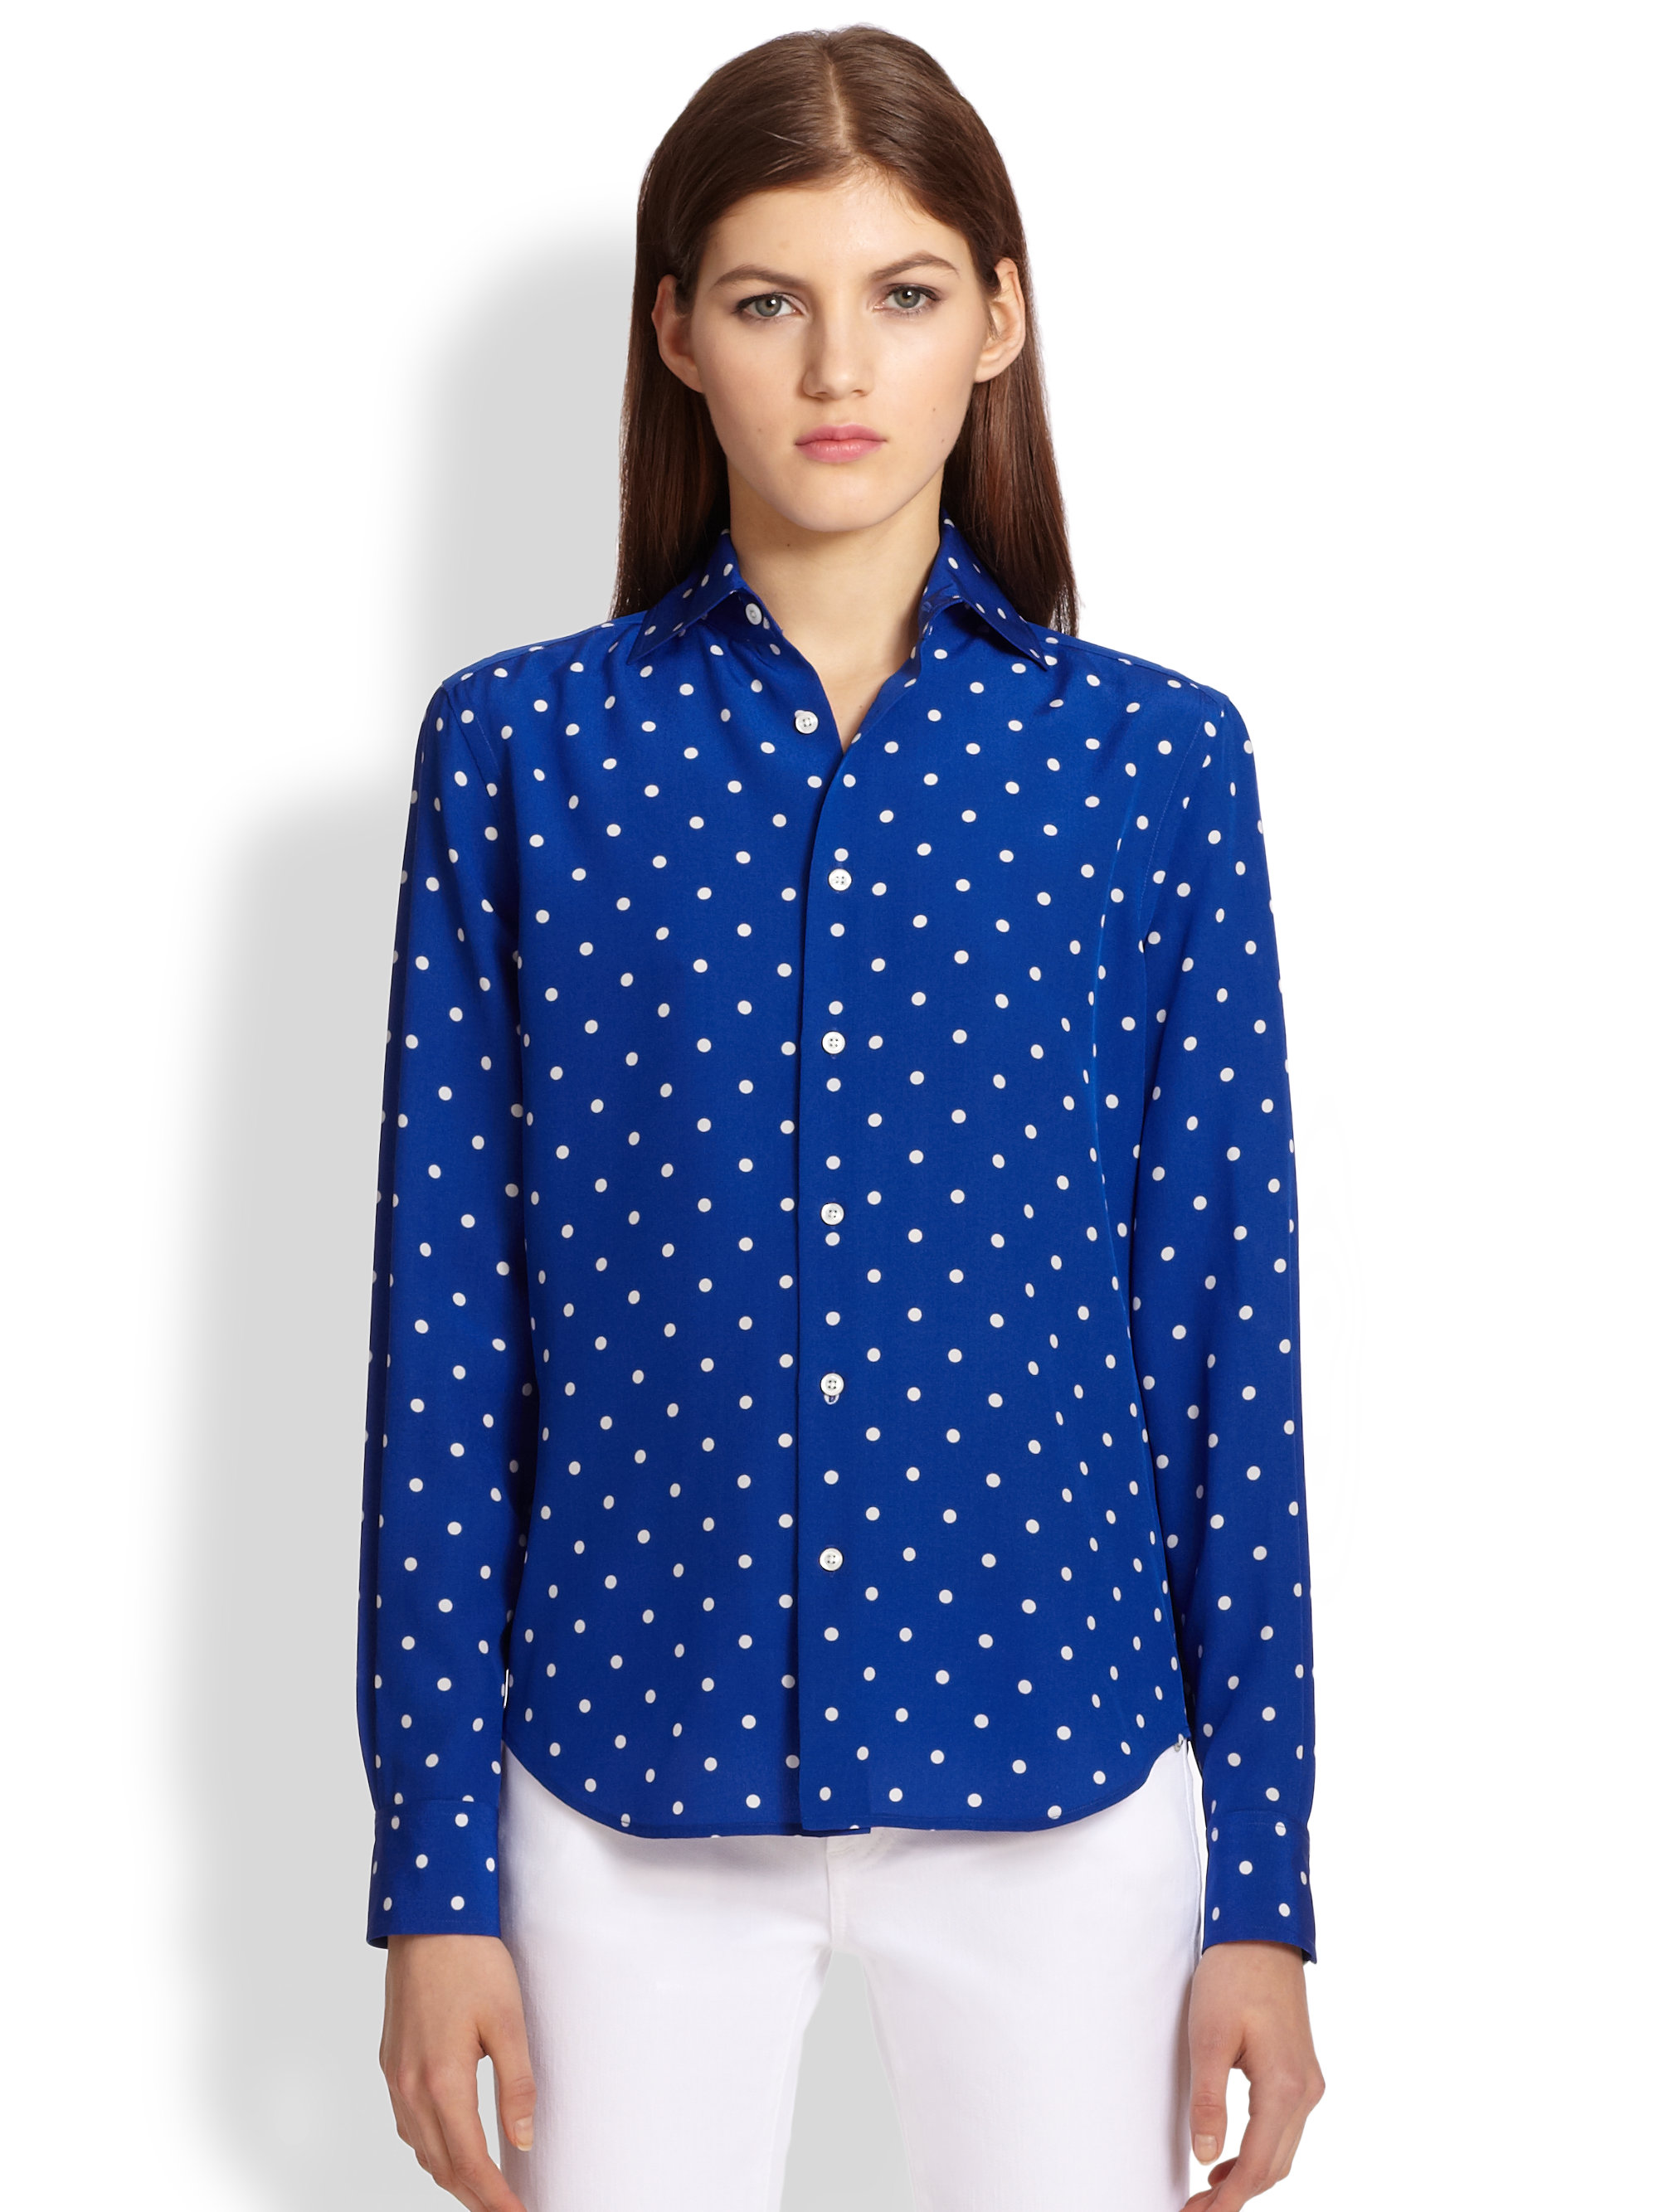 0f38ffe0c78ed Lyst - Ralph lauren black label Caitlin Silk Polka Dot Shirt